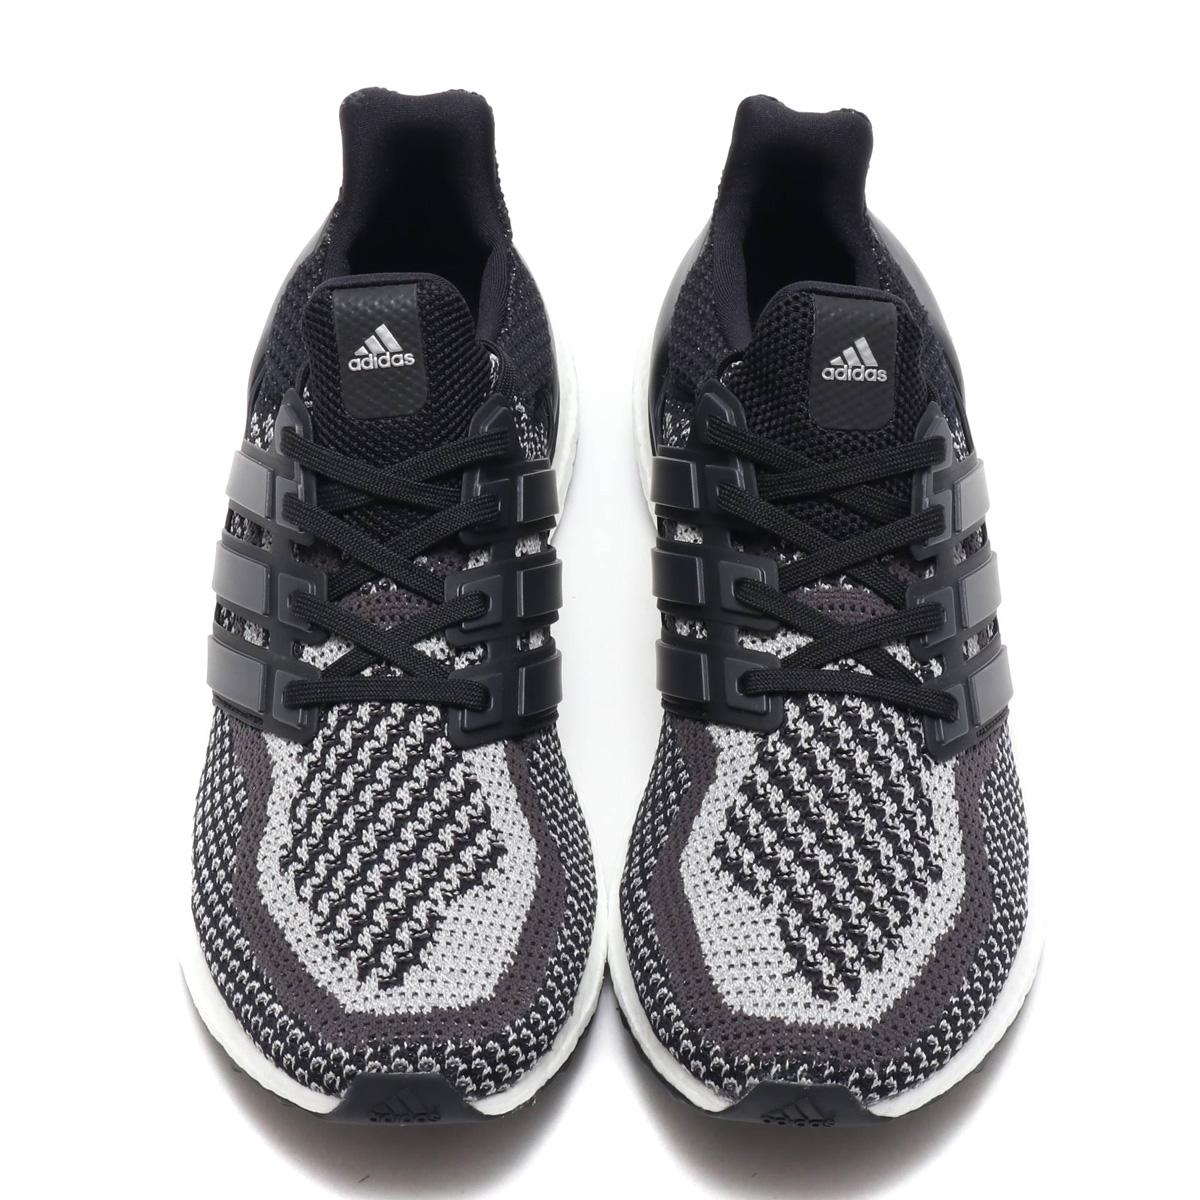 0af2d77d85a adidas UltraBOOST Ltd Glow (Adidas ultra boost Ltd glow) CORE BLACK CORE  BLACK CORE BLACK 18FW-I